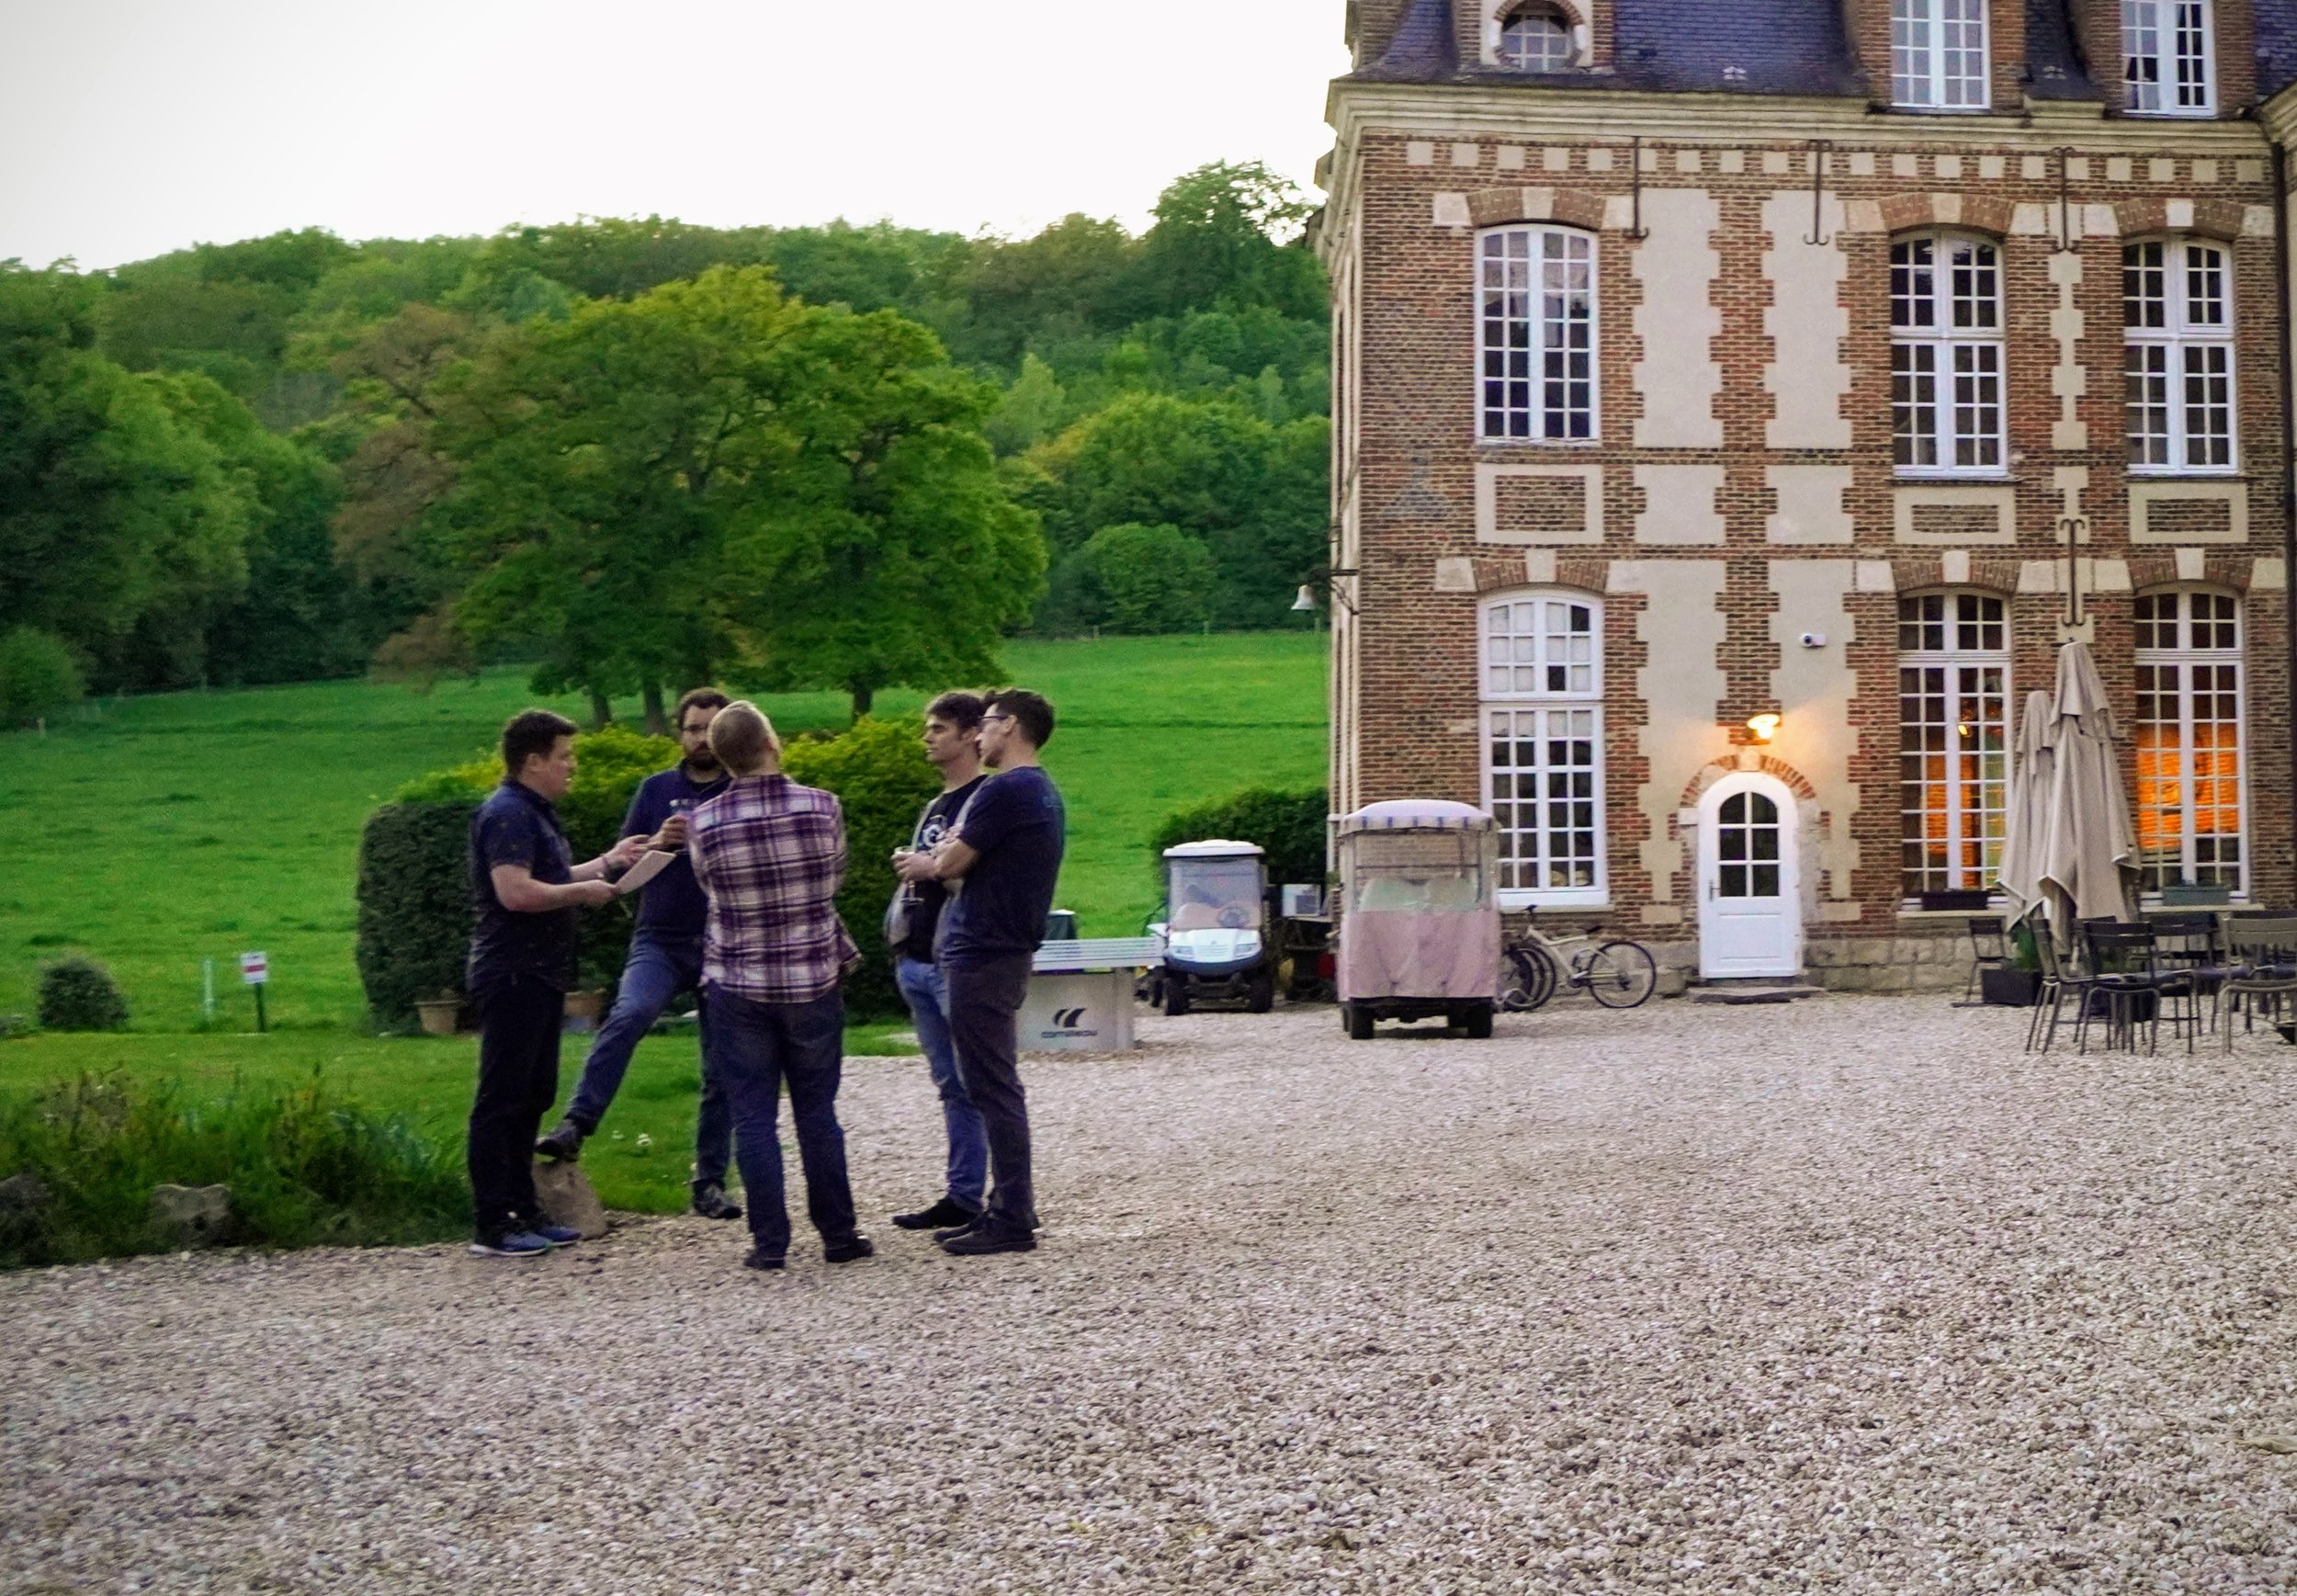 chateau_w_people.jpg